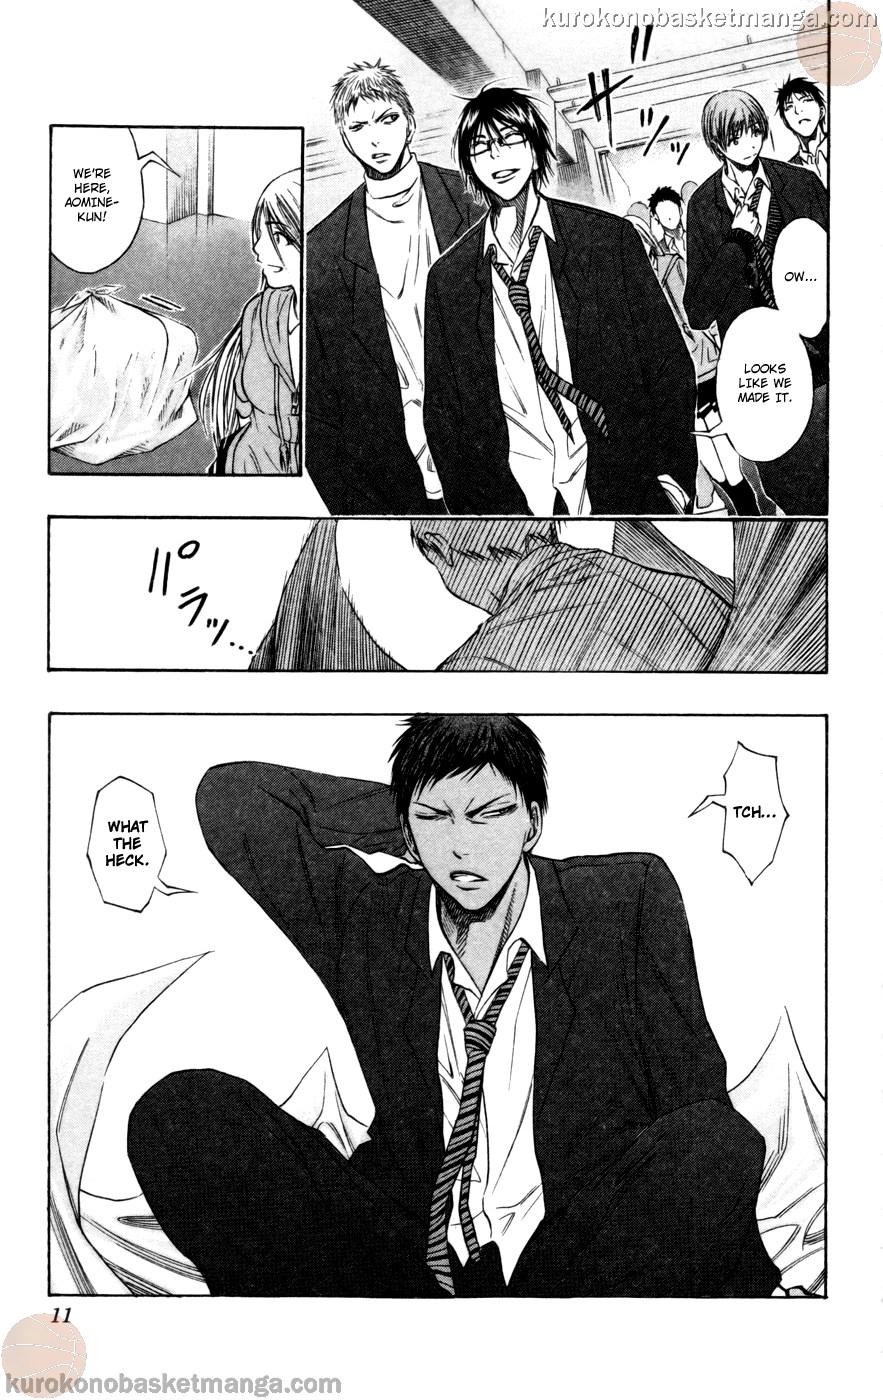 Kuroko no Basket Manga Chapter 100 - Image 09